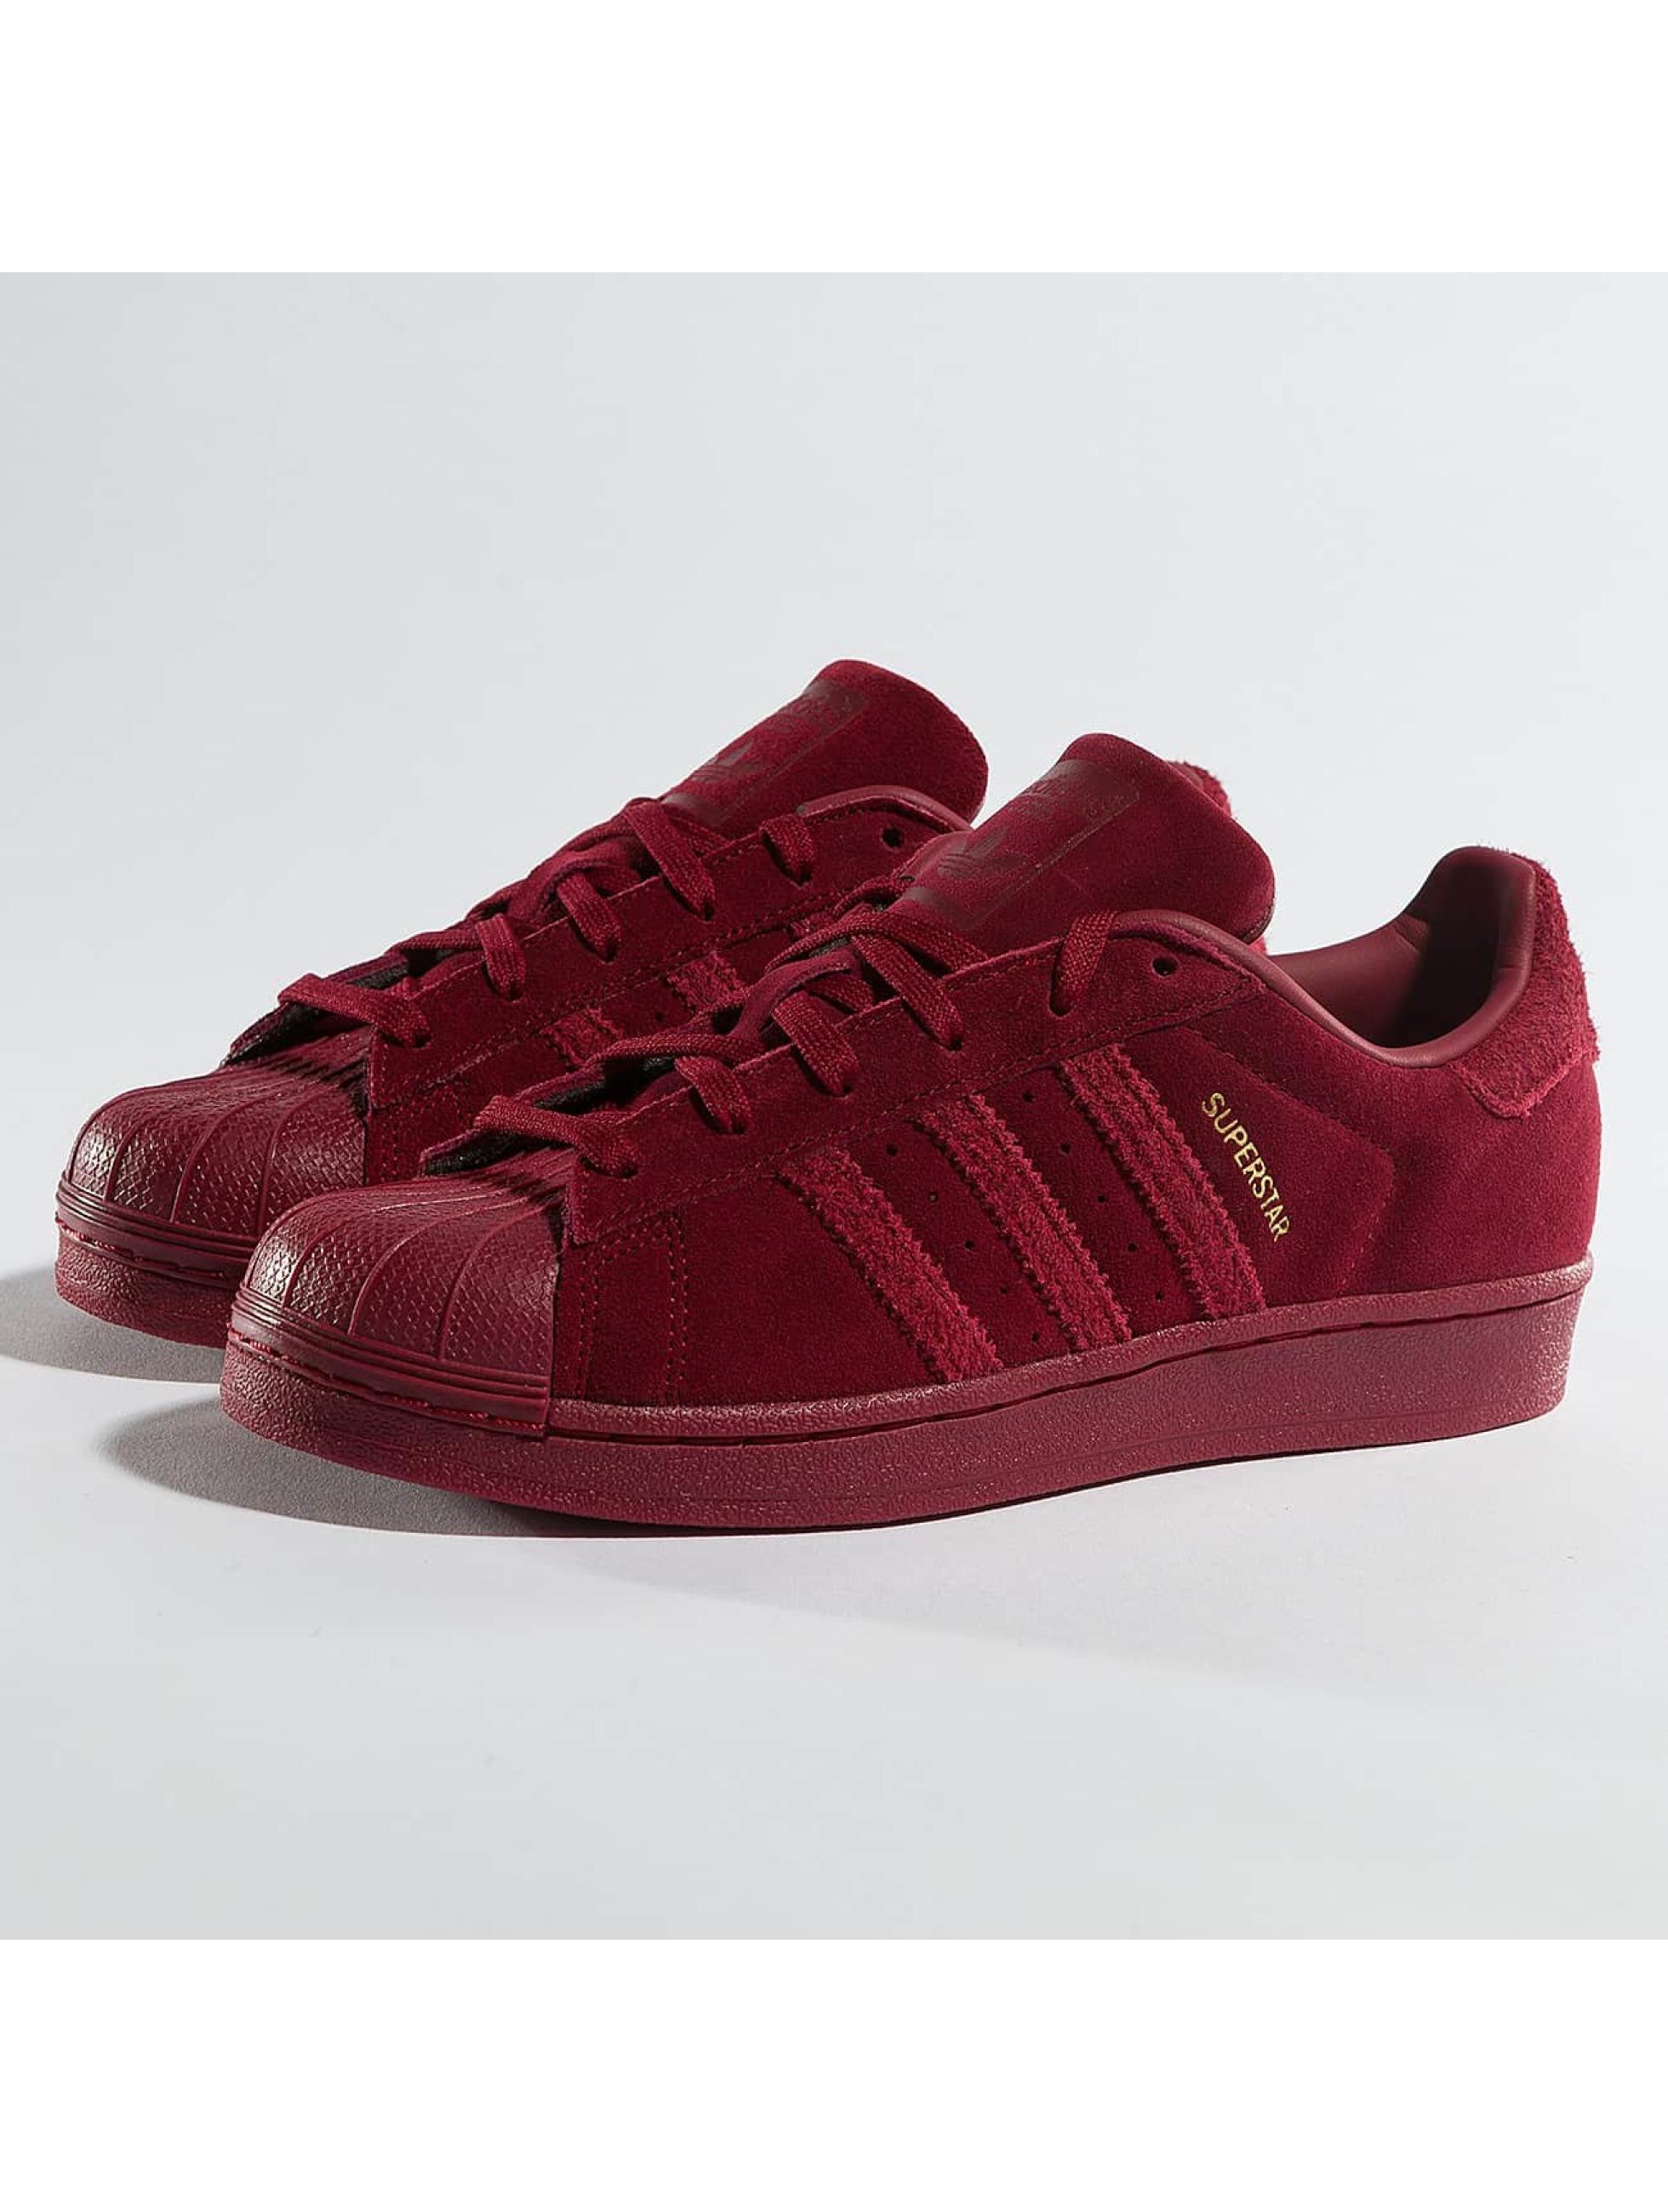 adidas Damen Sneaker Superstar Sneakers in rot 359420